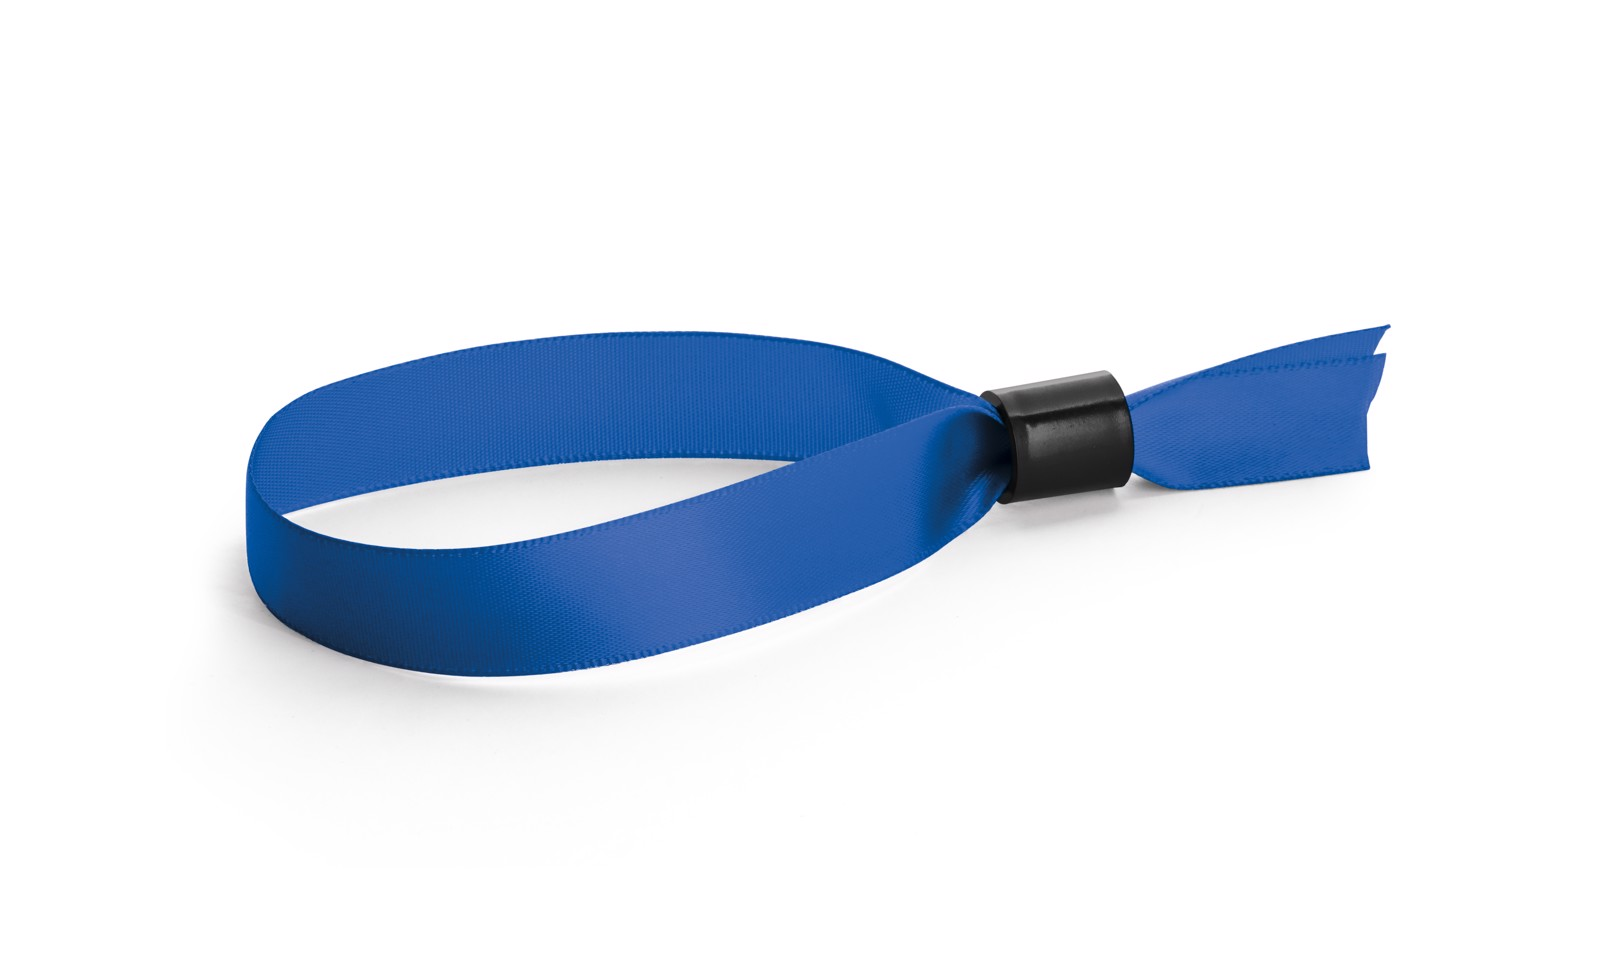 SECCUR. Απαραβίαστο βραχιόλι - Μπλε Ρουά